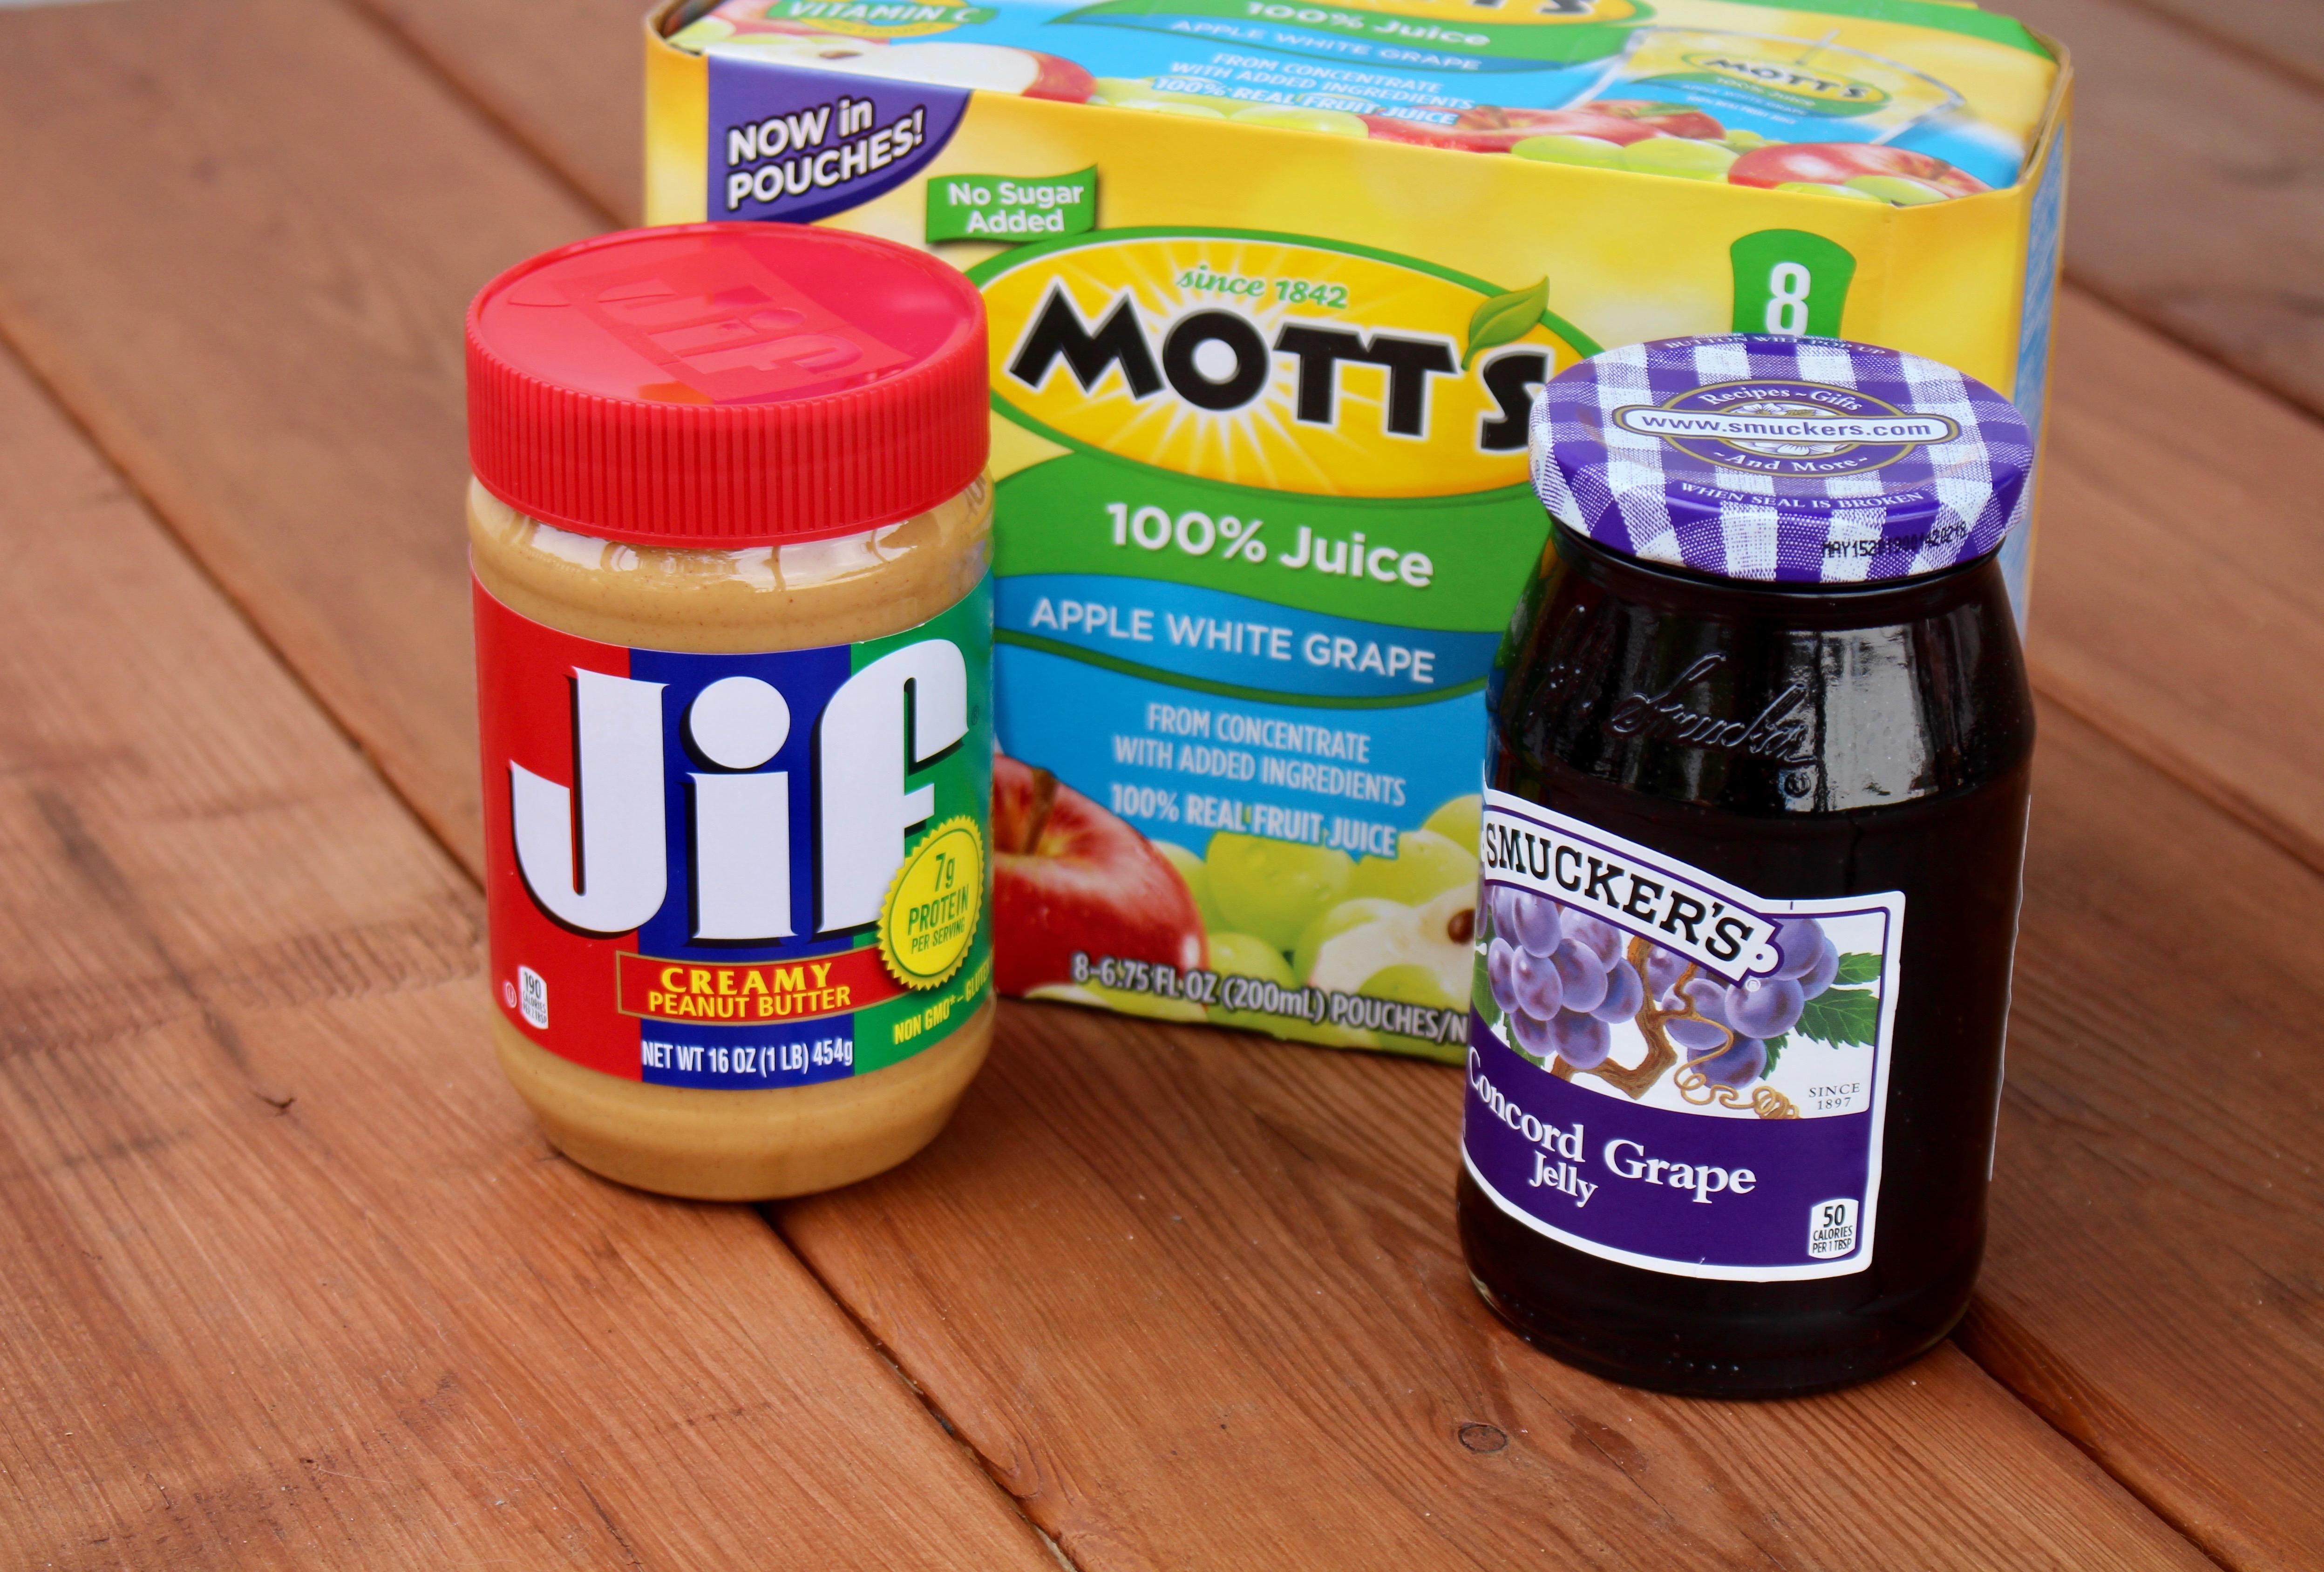 Jif, Smucker's and Mott's